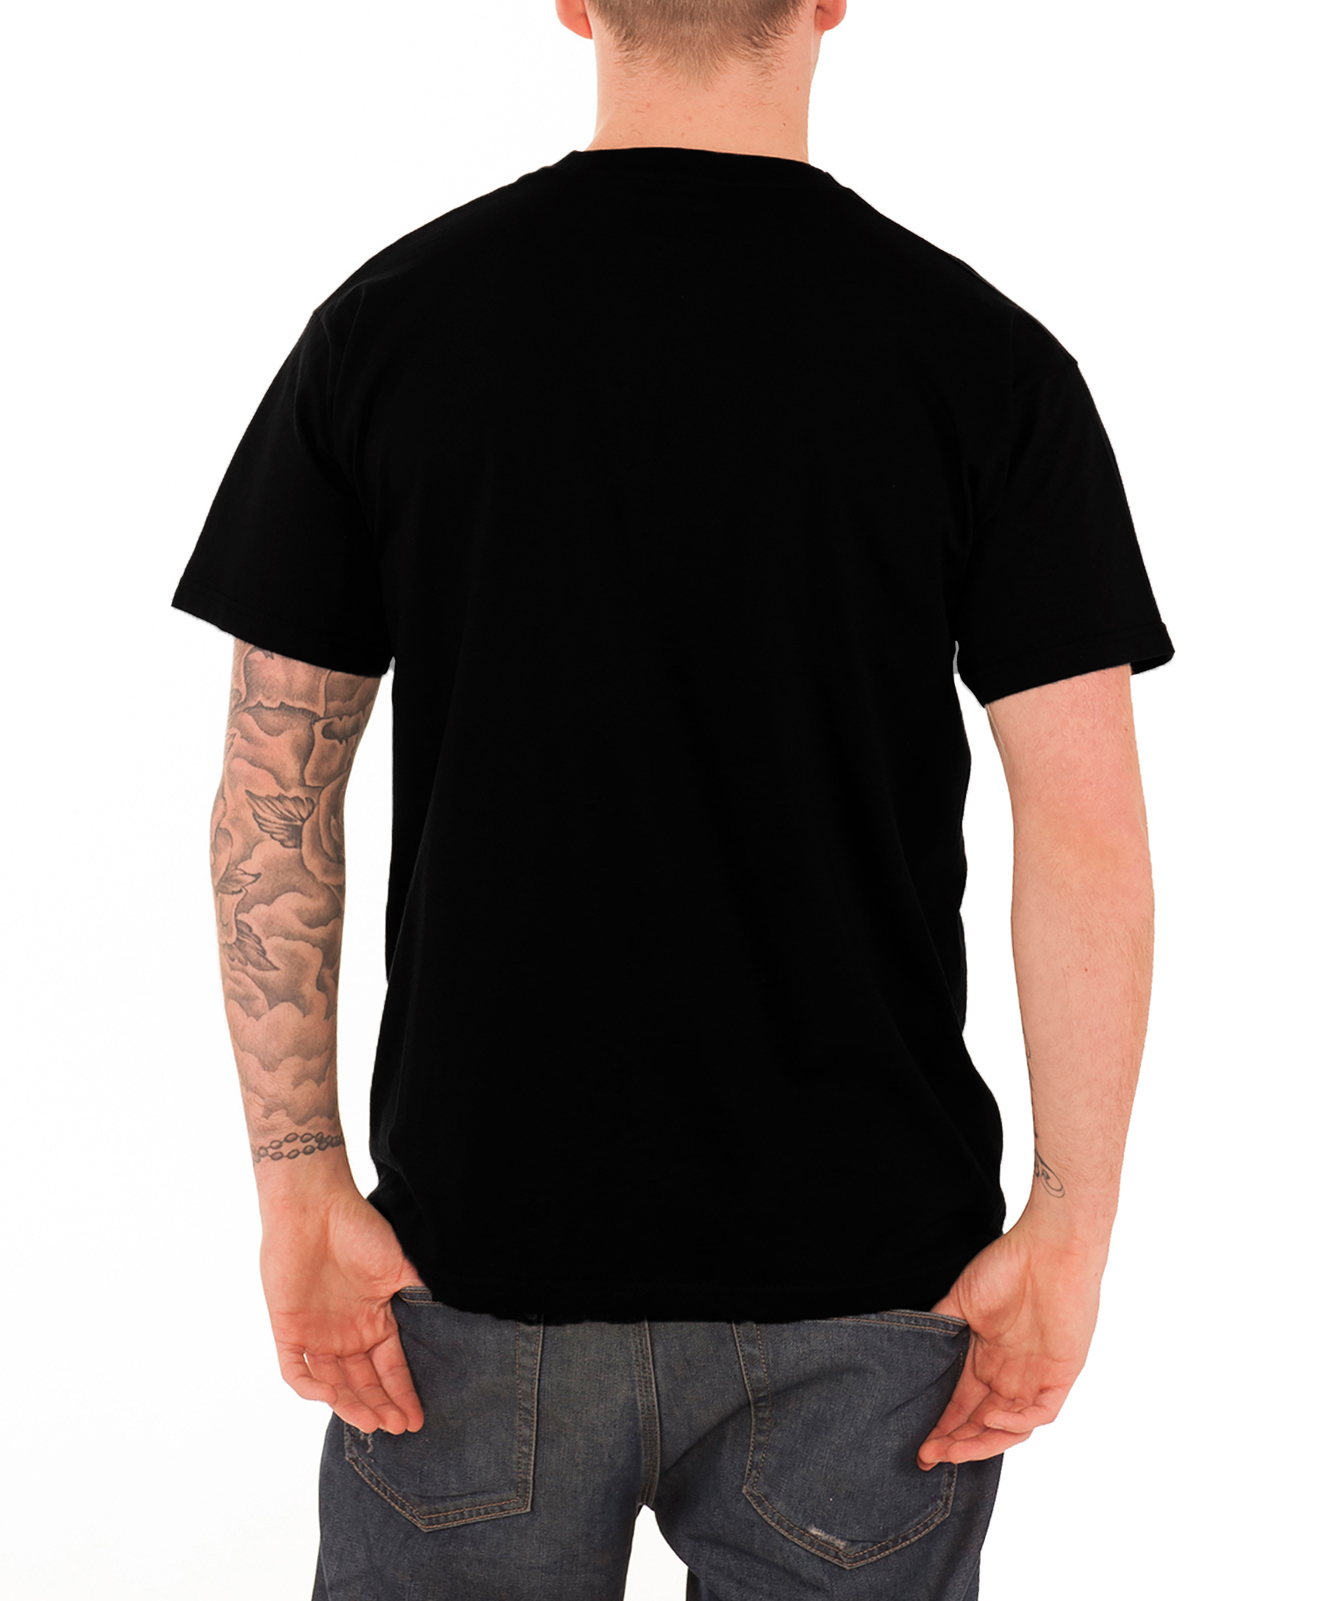 Official-Gas-Monkey-Garage-T-Shirt-Official-GMG-Logo-Kustom-Builds-new-Mens Indexbild 5